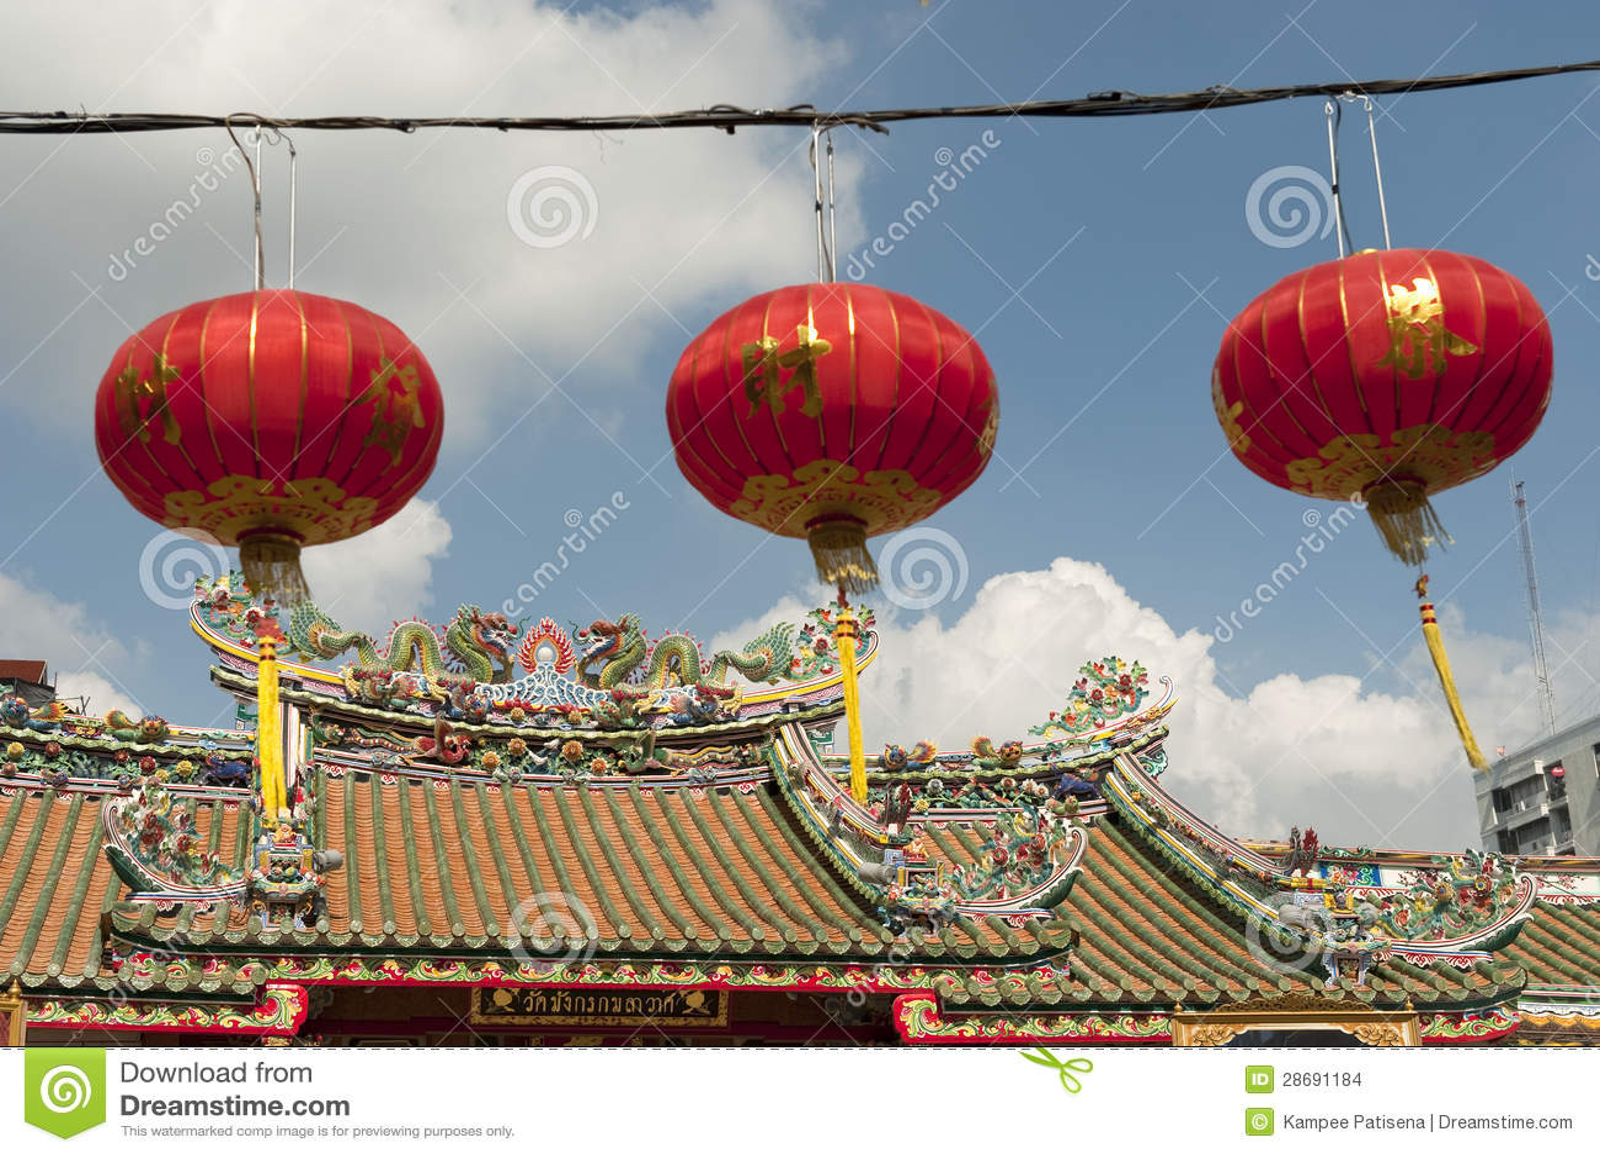 Lampade Cinesi Di Carta.Lanterne Di Carta Cinesi Durante L Nuovo Anno Cinese Citta